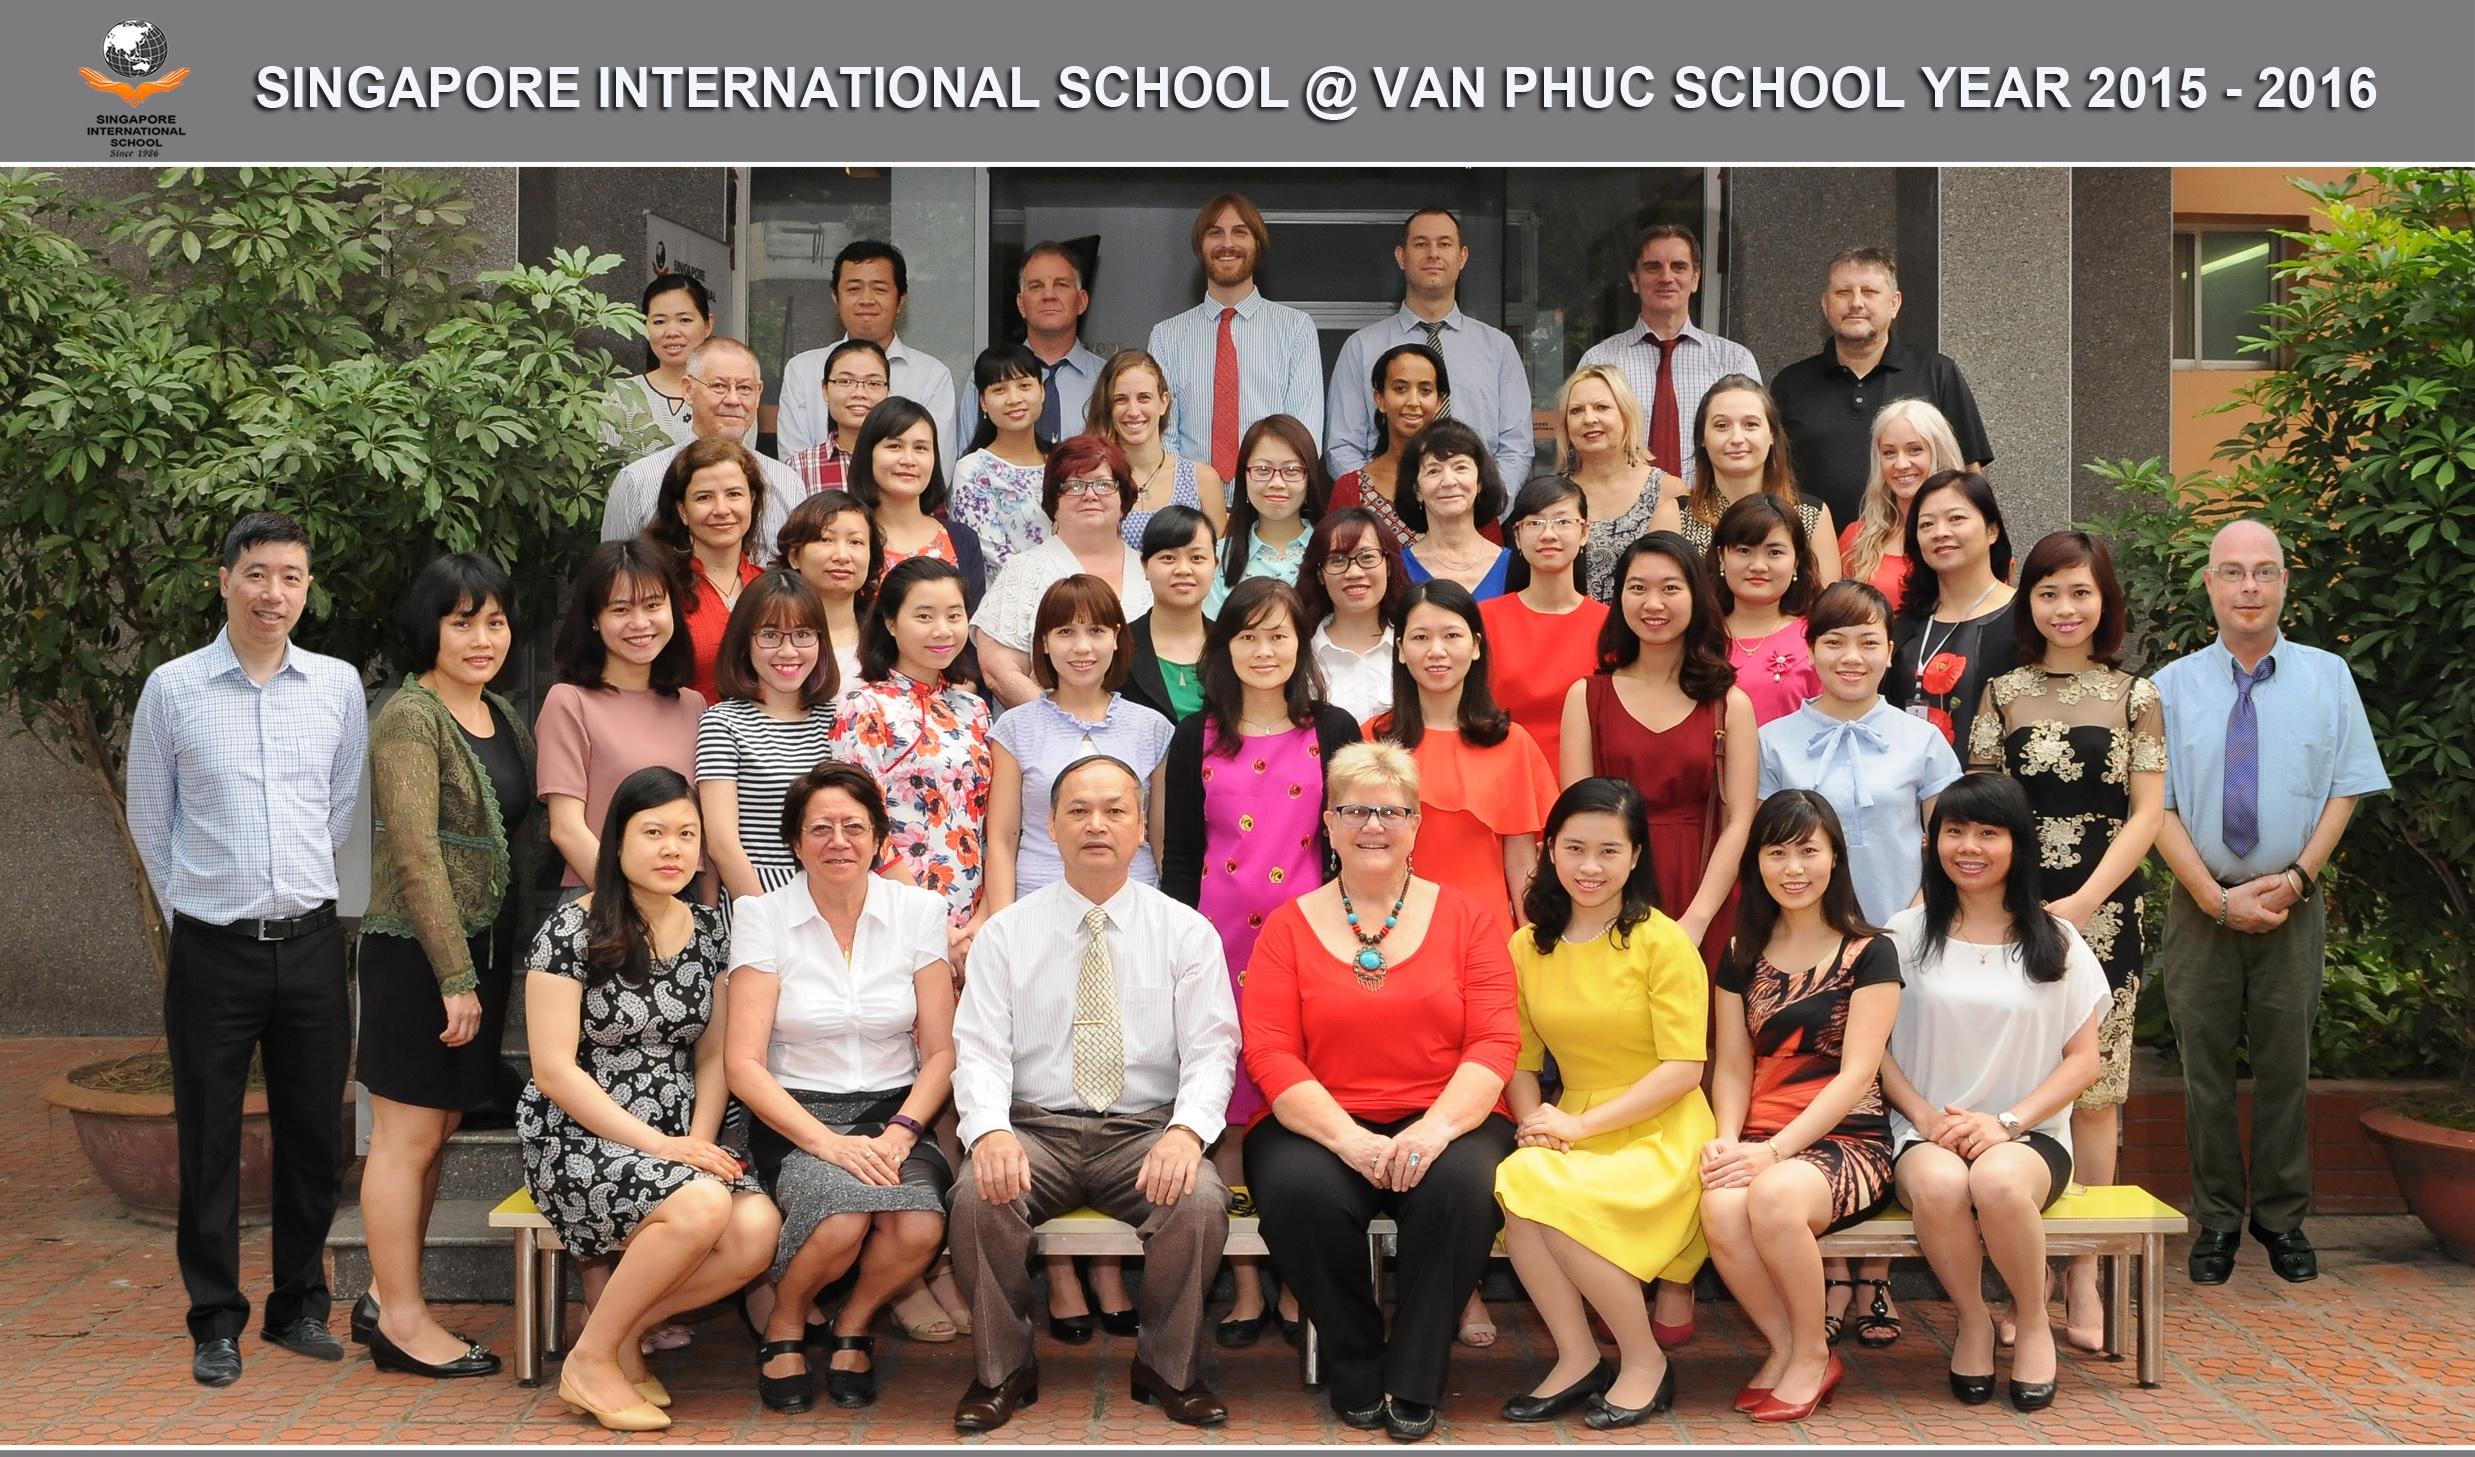 Van-Phuc-2014-2015-2